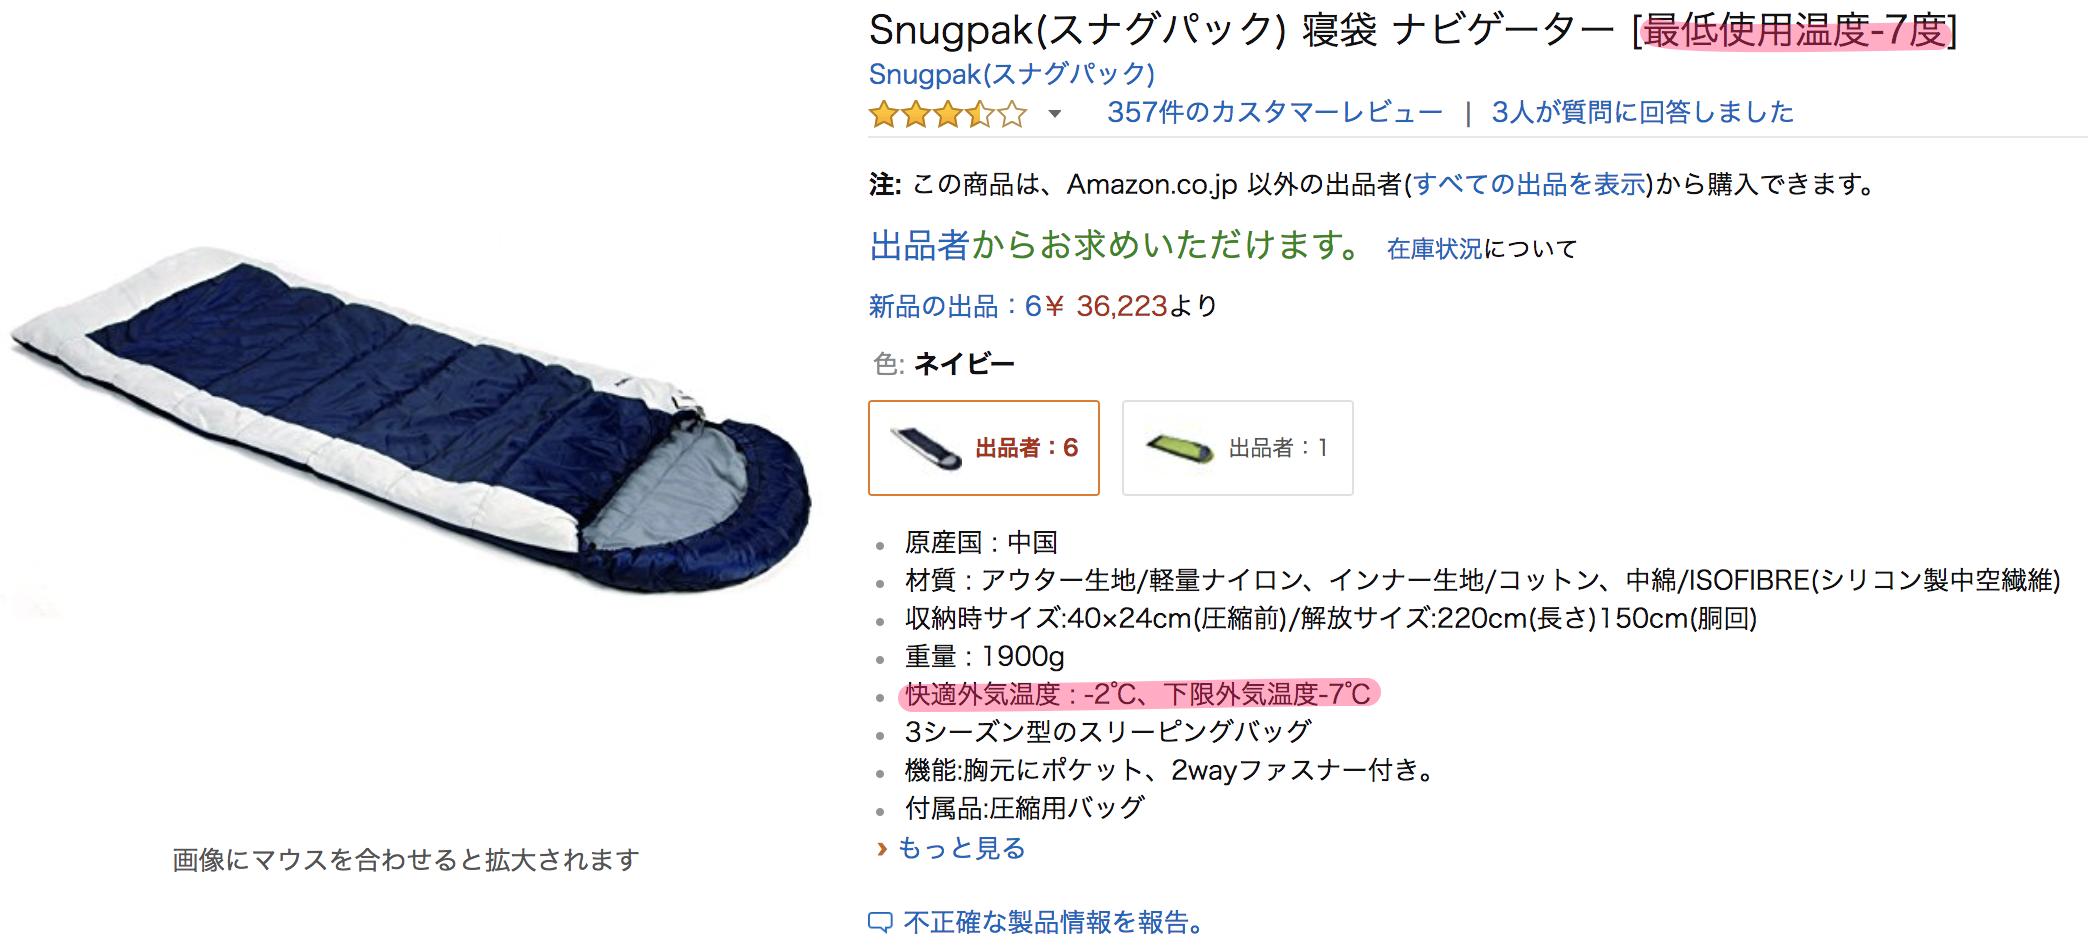 Amazon___Snugpak_スナグパック__寝袋_ナビゲーター_ネイビー_ホワイト_RH__最低使用温度-7度____Snugpak_スナグパック____寝袋・シュラフ